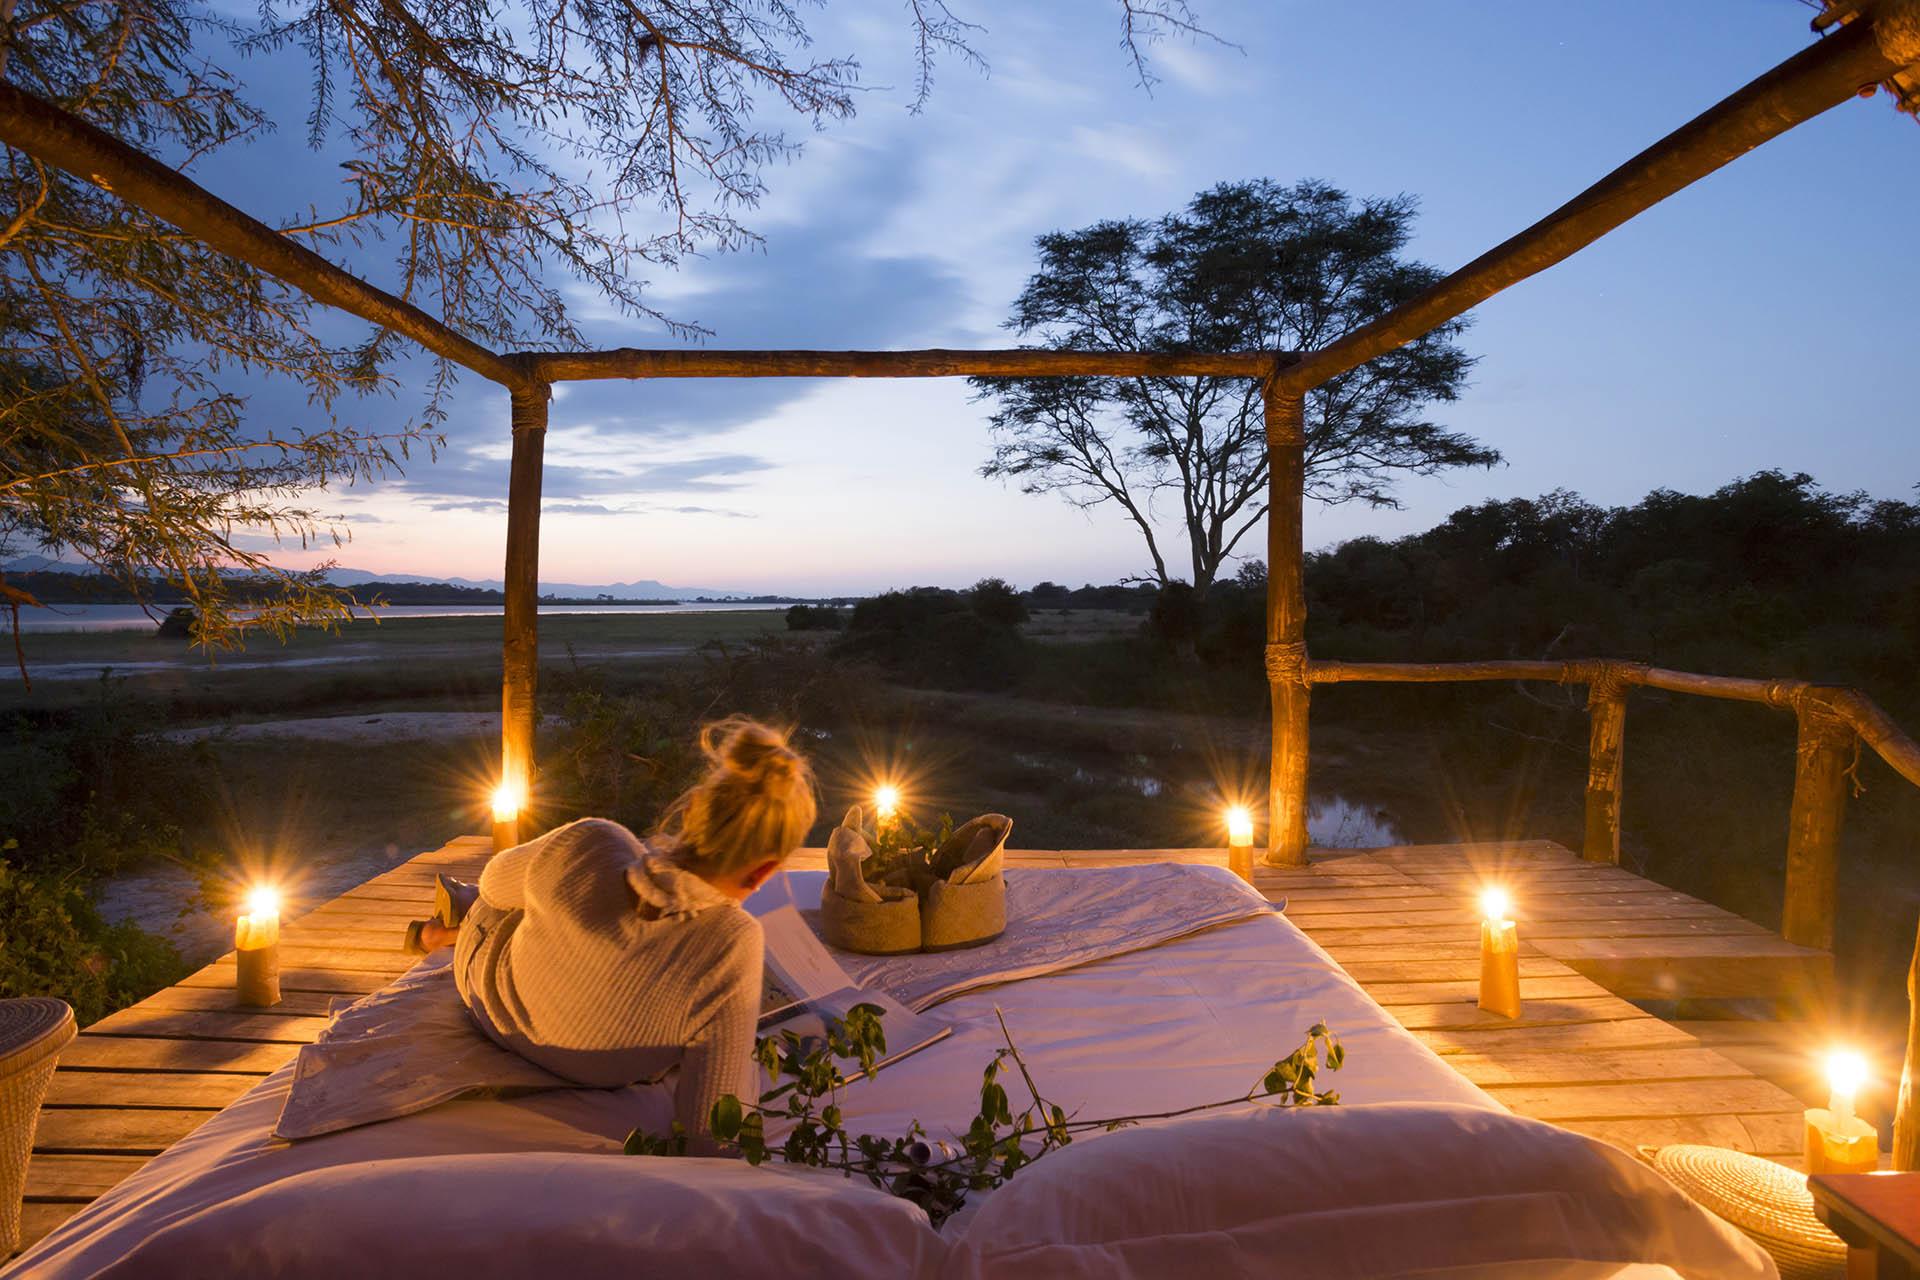 lake malawi national park malawi-national-parks-reserves-malawian-style-malawi-adventures-experiences-specialist-tour-operator-mvuu-lodge